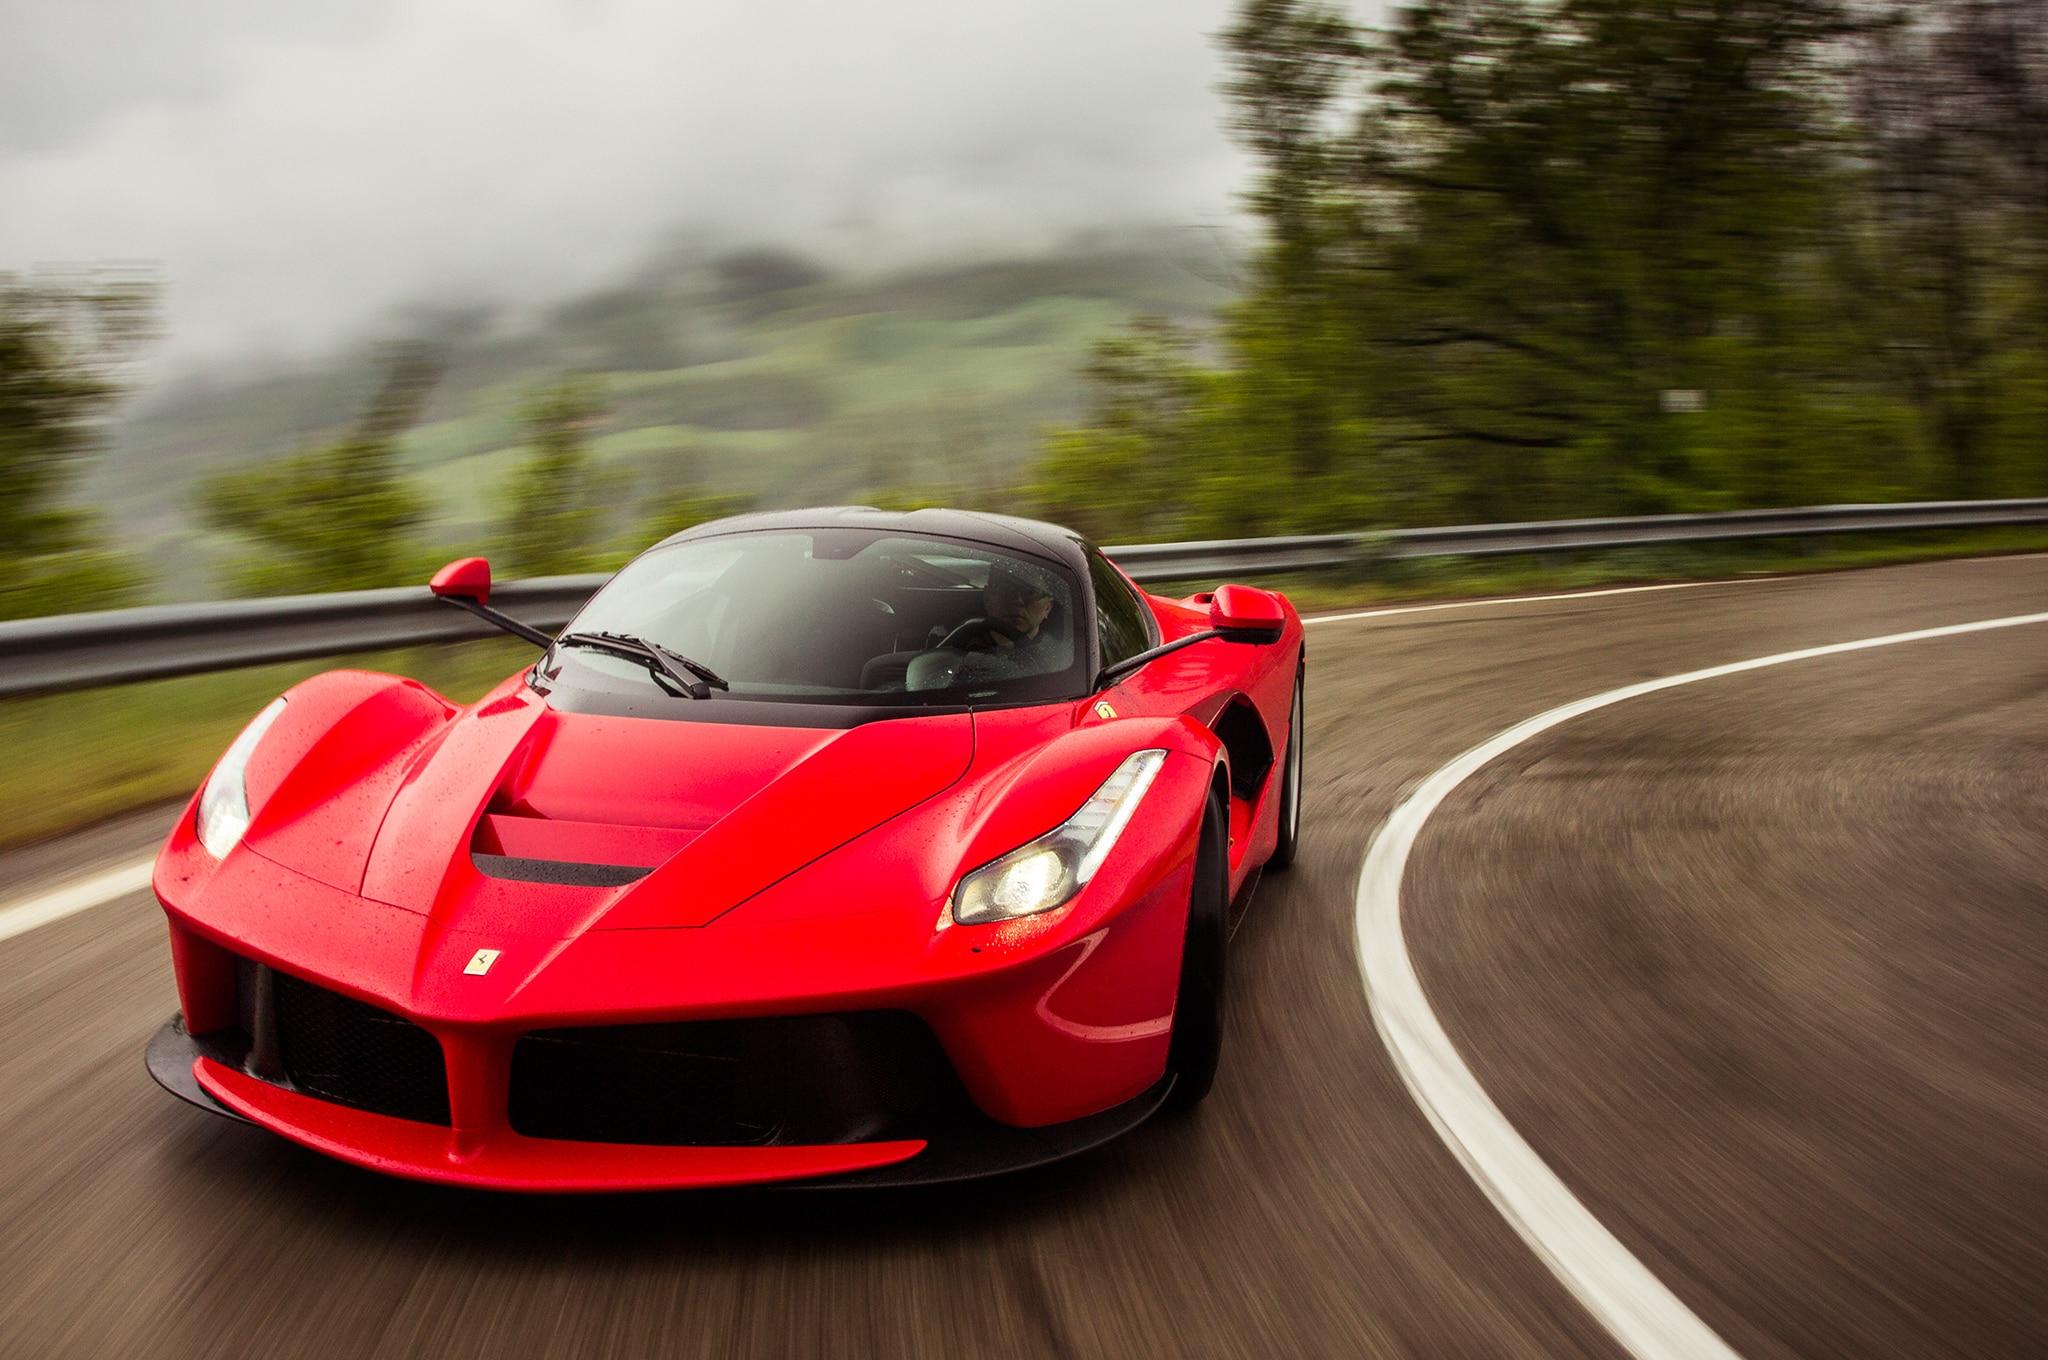 2014 Ferrari Laferrari Front Three Quarters Motion 11